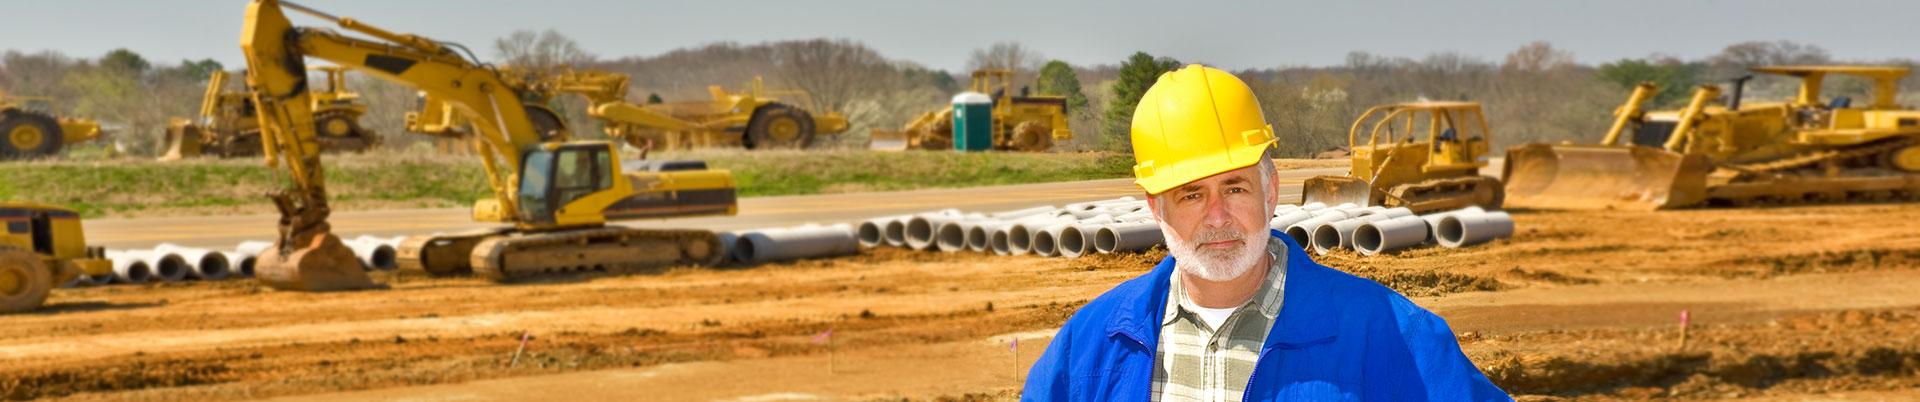 Construction Equipment Management Software